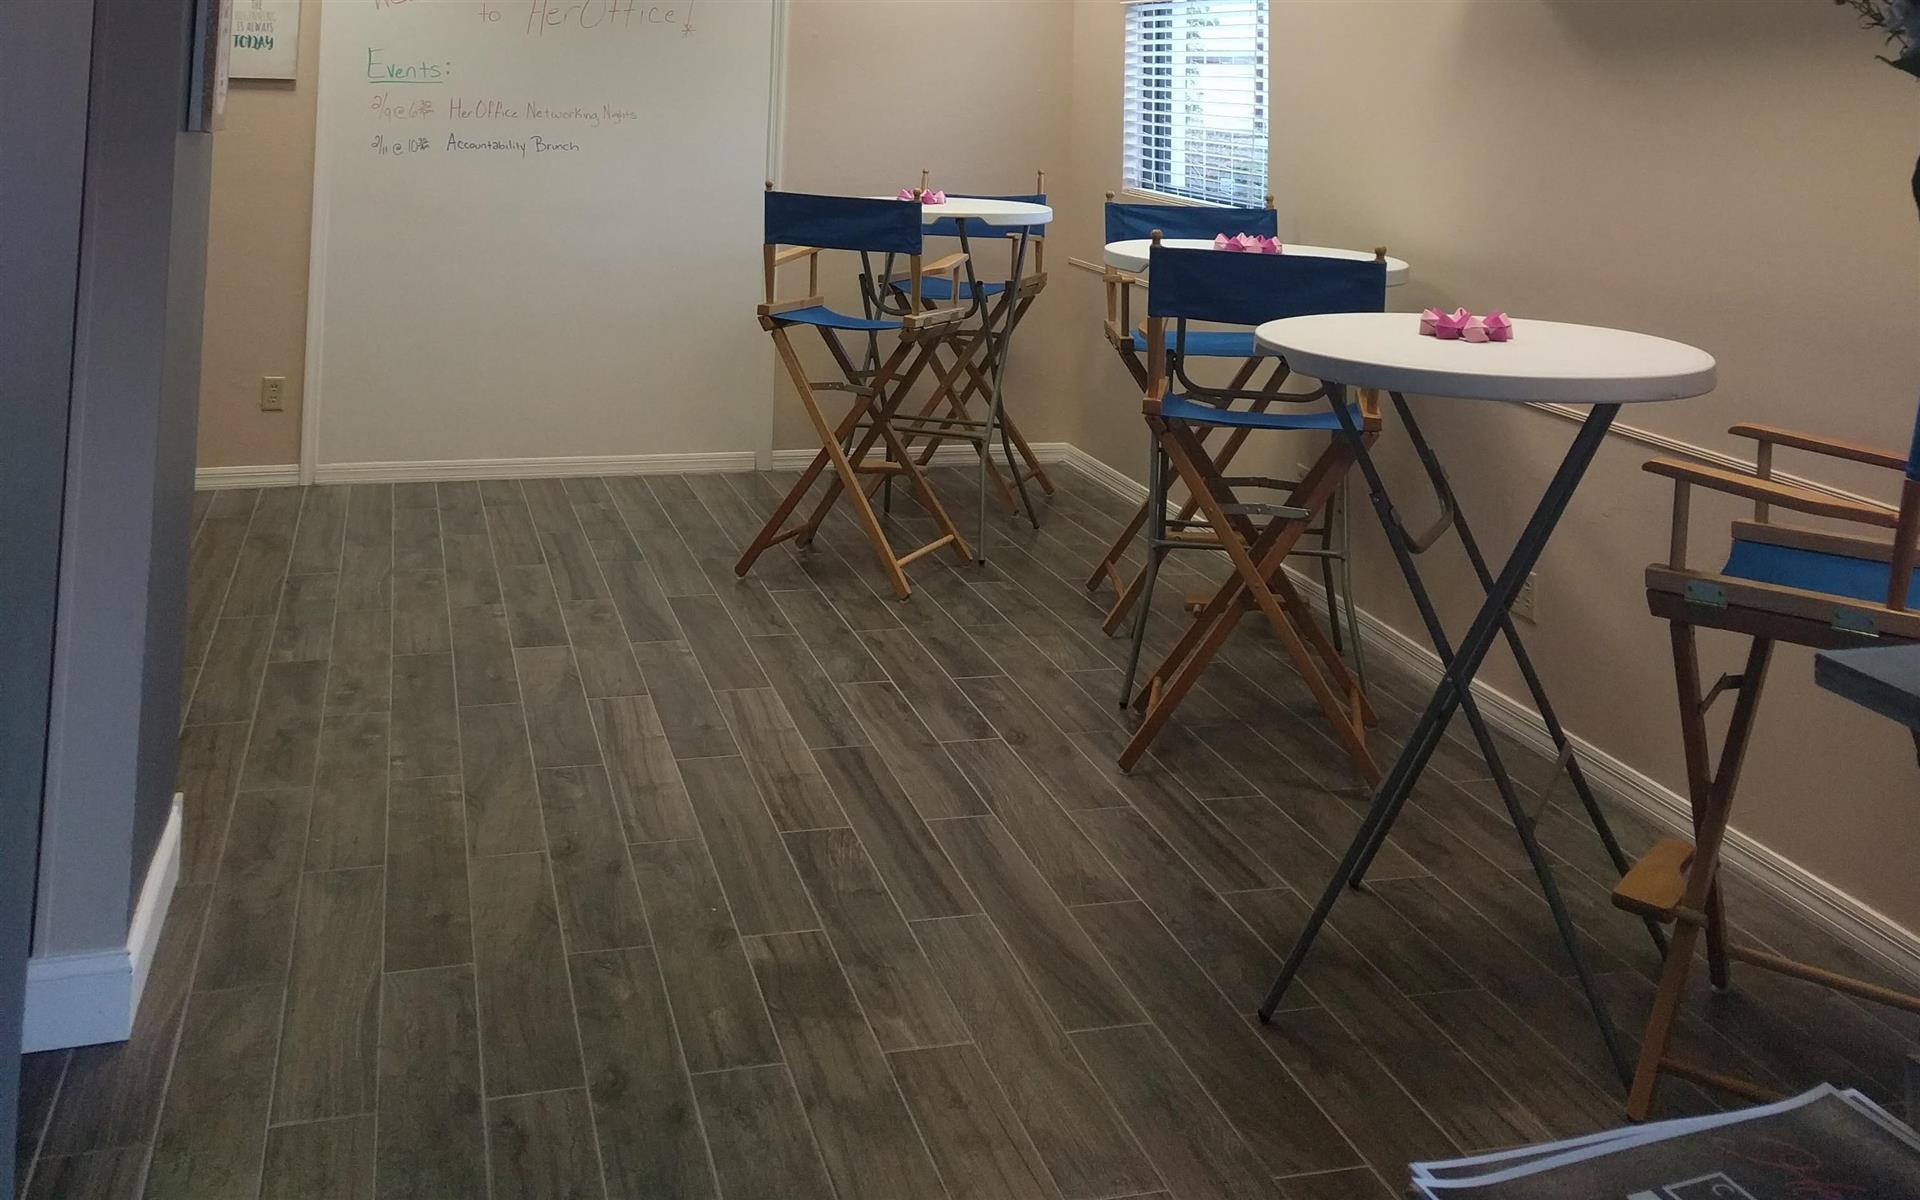 HerOffice Co-Work Space - Her Hours